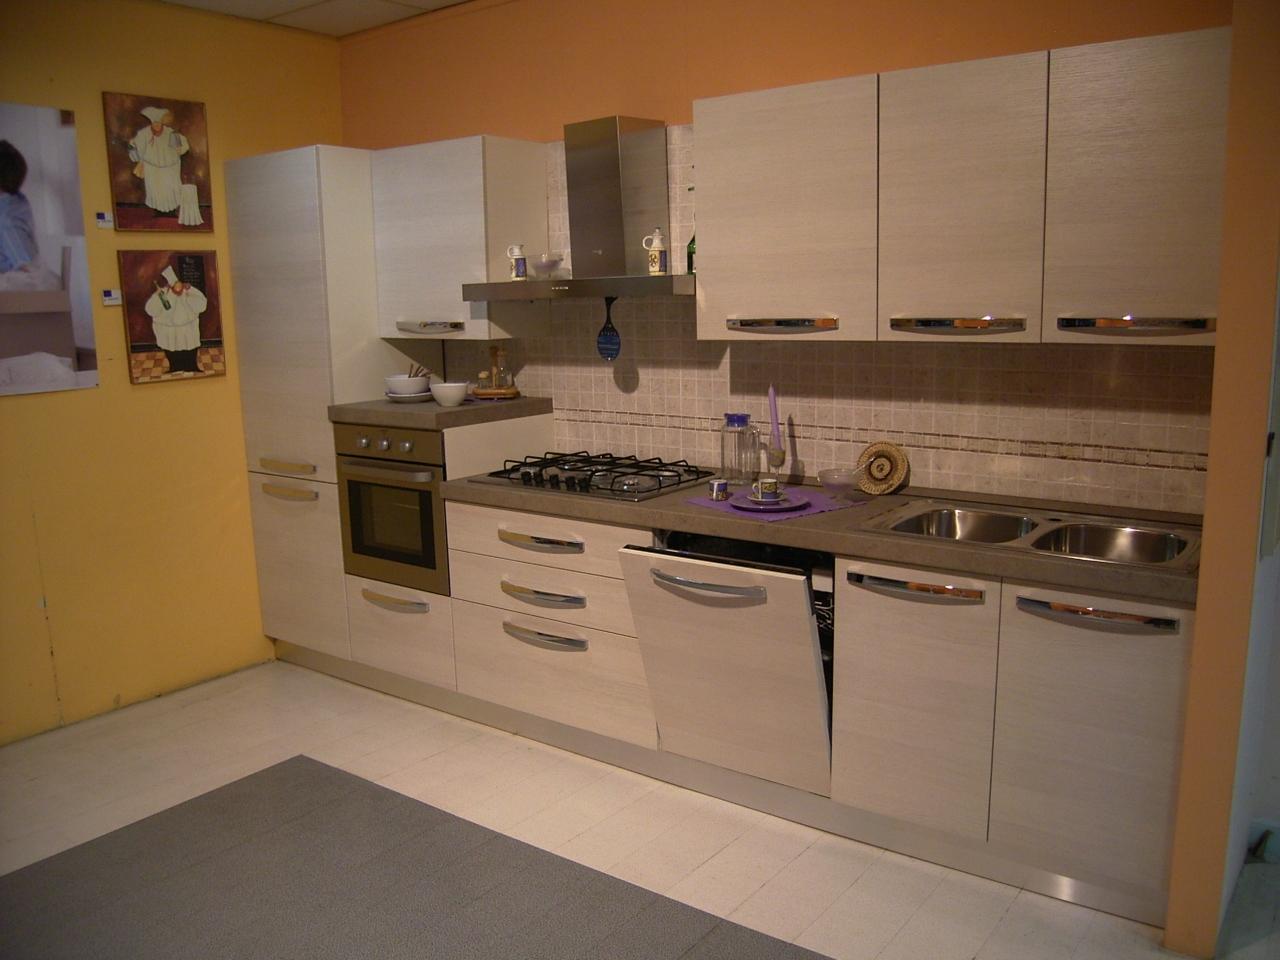 Emejing Mobilturi Cucine Catalogo Photos - Home Ideas - tyger.us